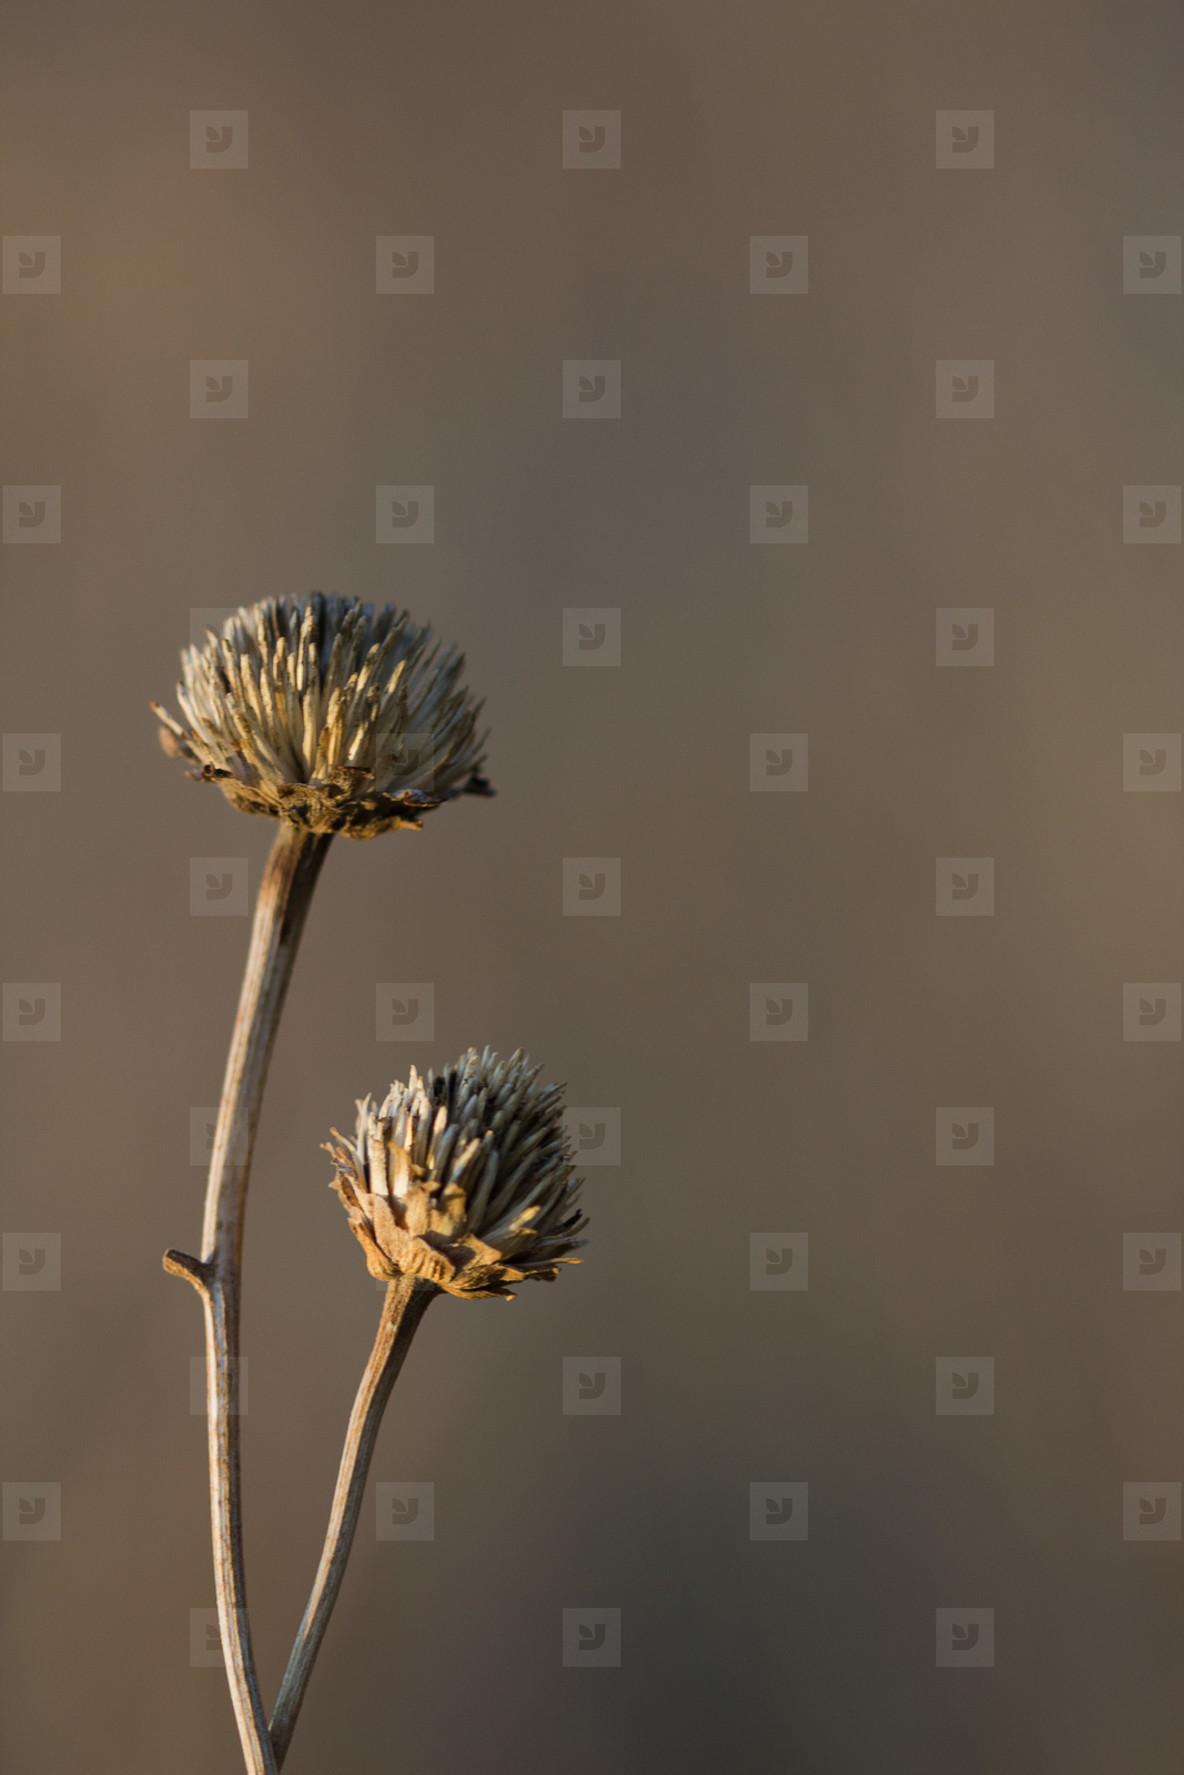 Dead clovers